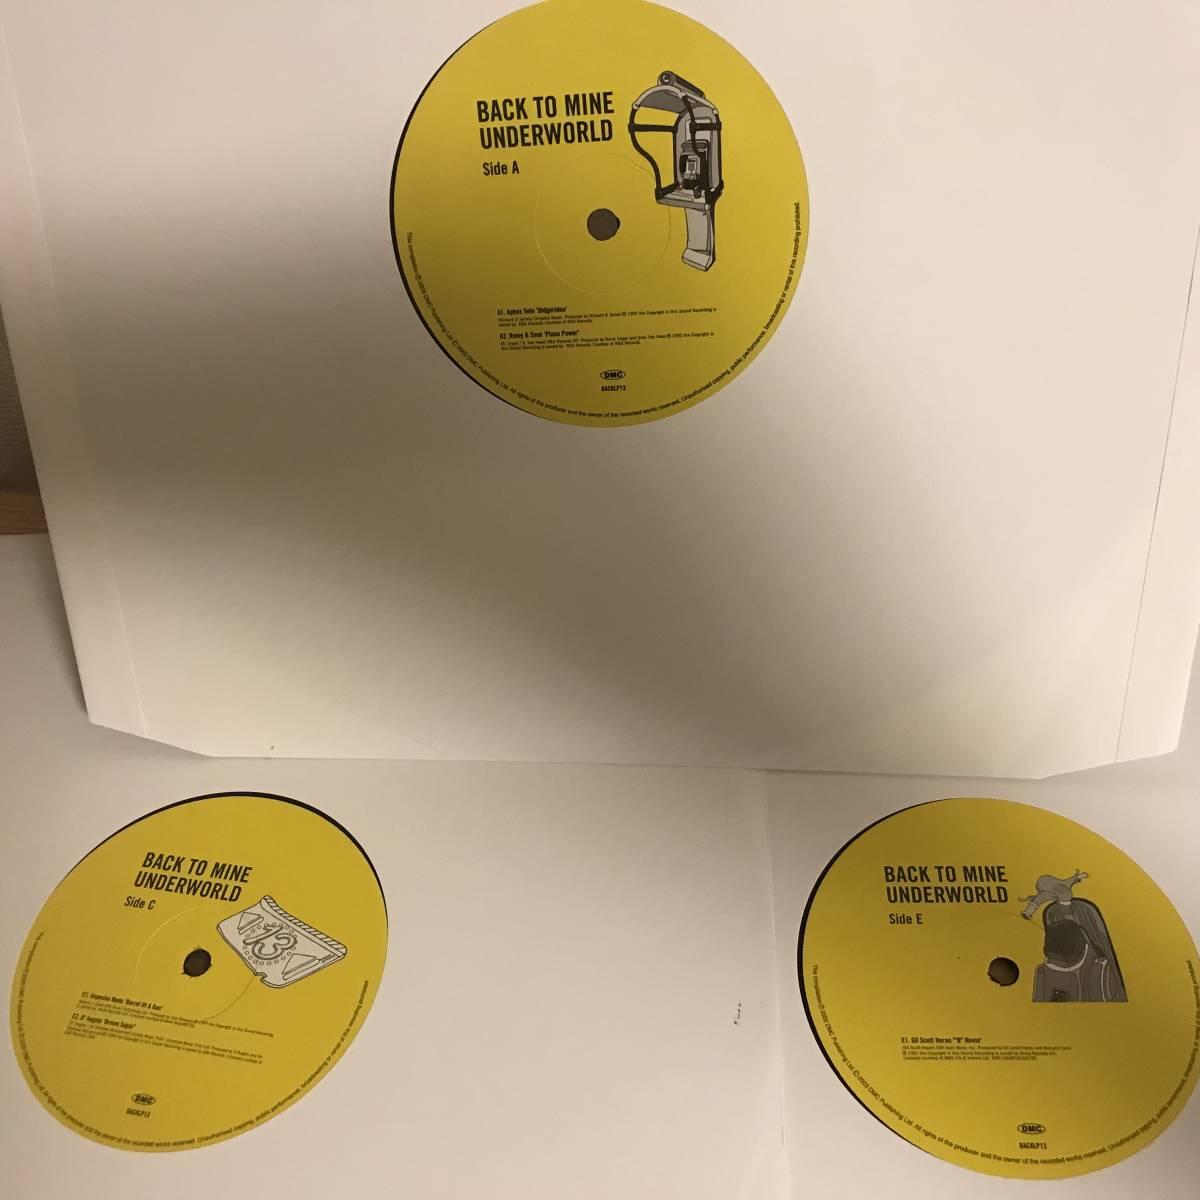 Underworld - Back To Mine (3LP) Aphex Twin / Depeche Mode / D'Angelo / TLC / Gil Scott-Heron / Gregory Isaacs_画像3